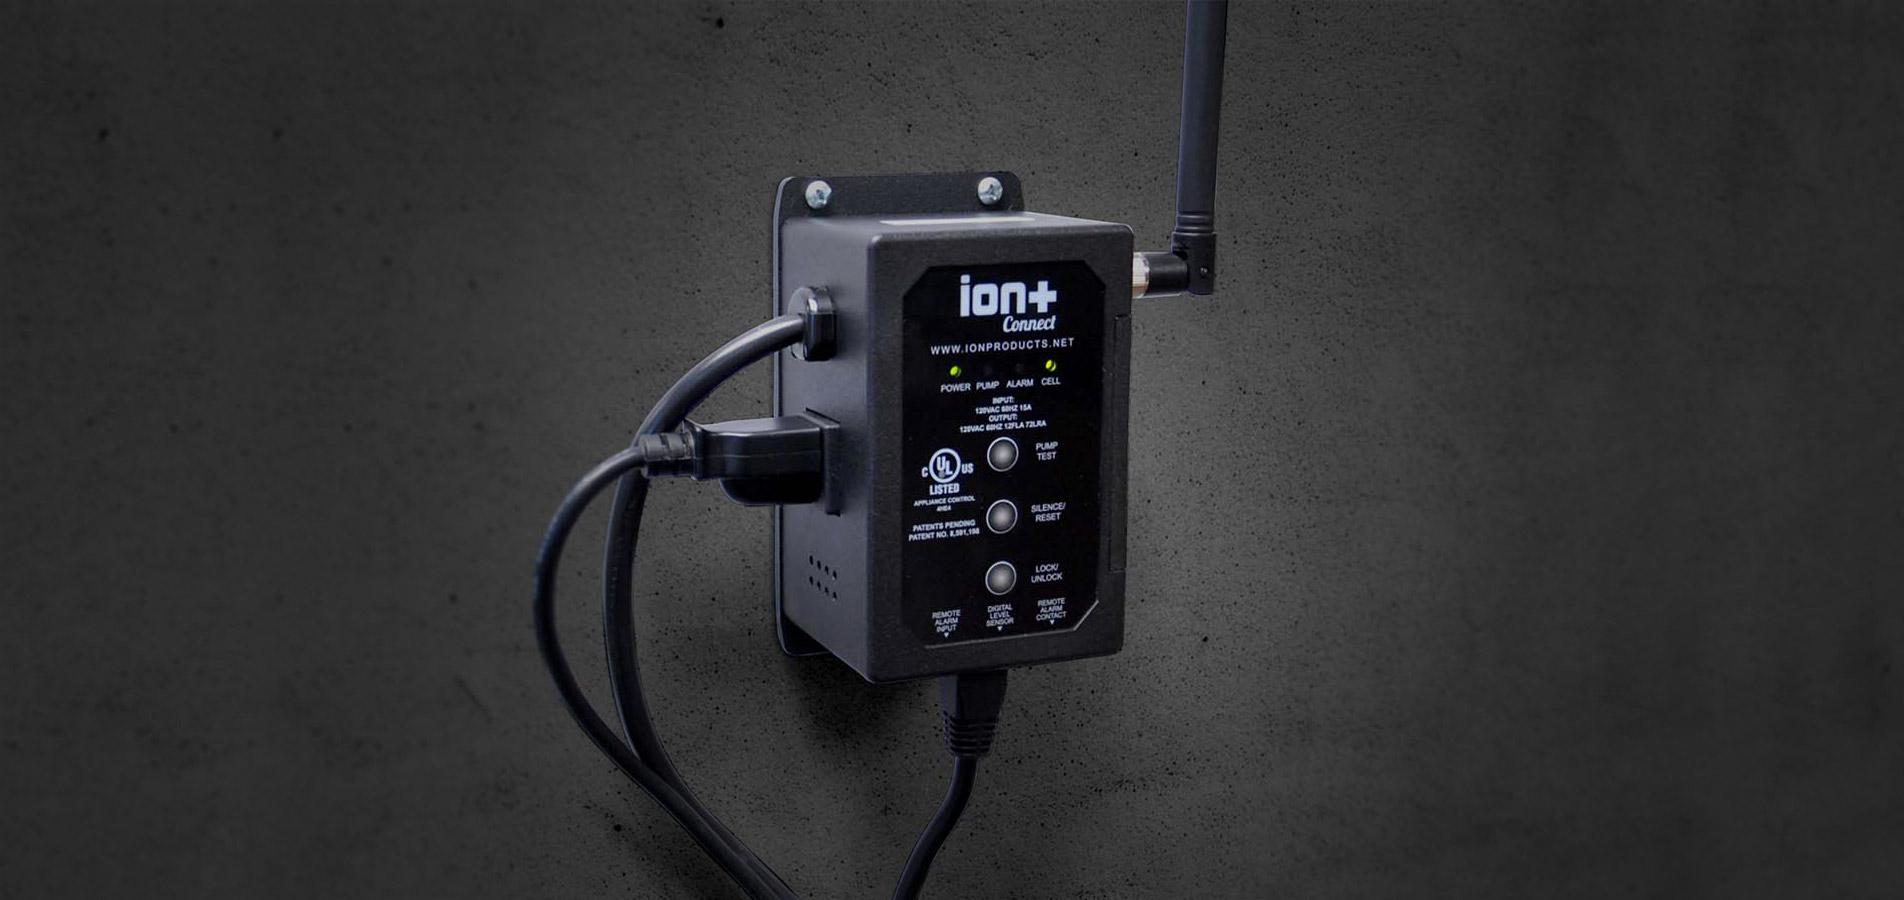 Sump Pump Alarm System